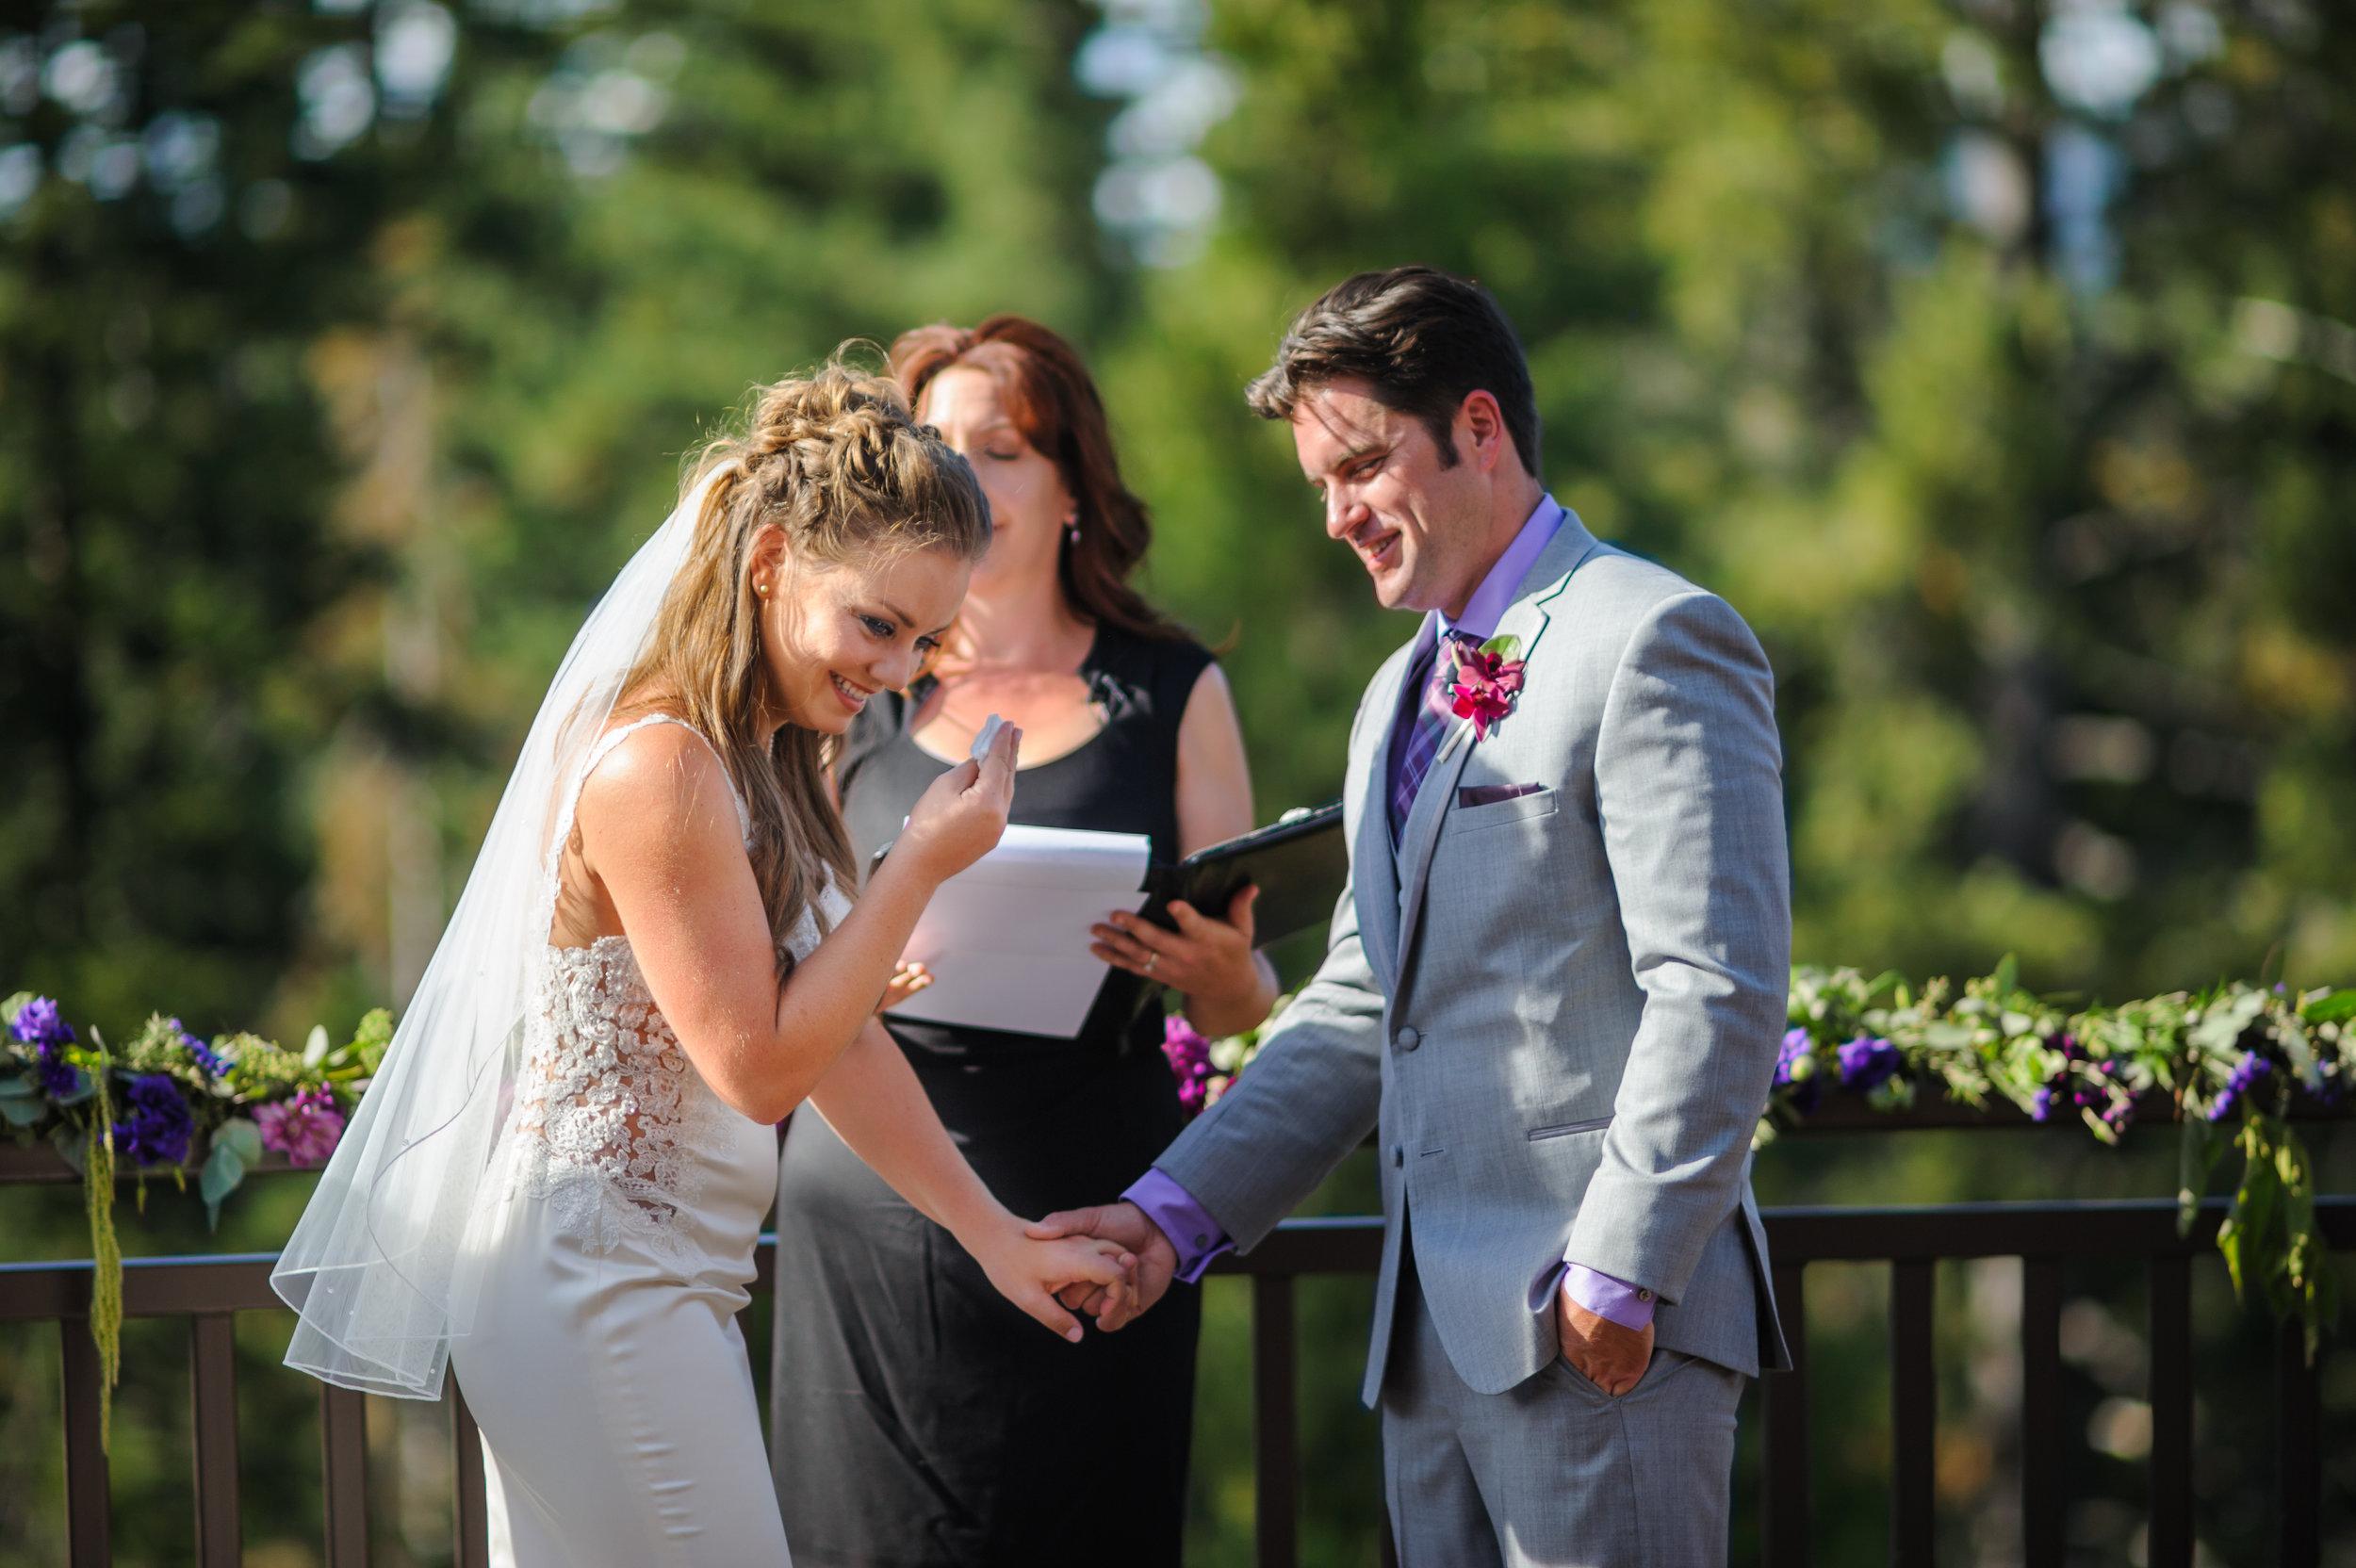 becca-jacob-019-tenaya-lodge-yosemite-wedding-photographer-katherine-nicole-photography.JPG